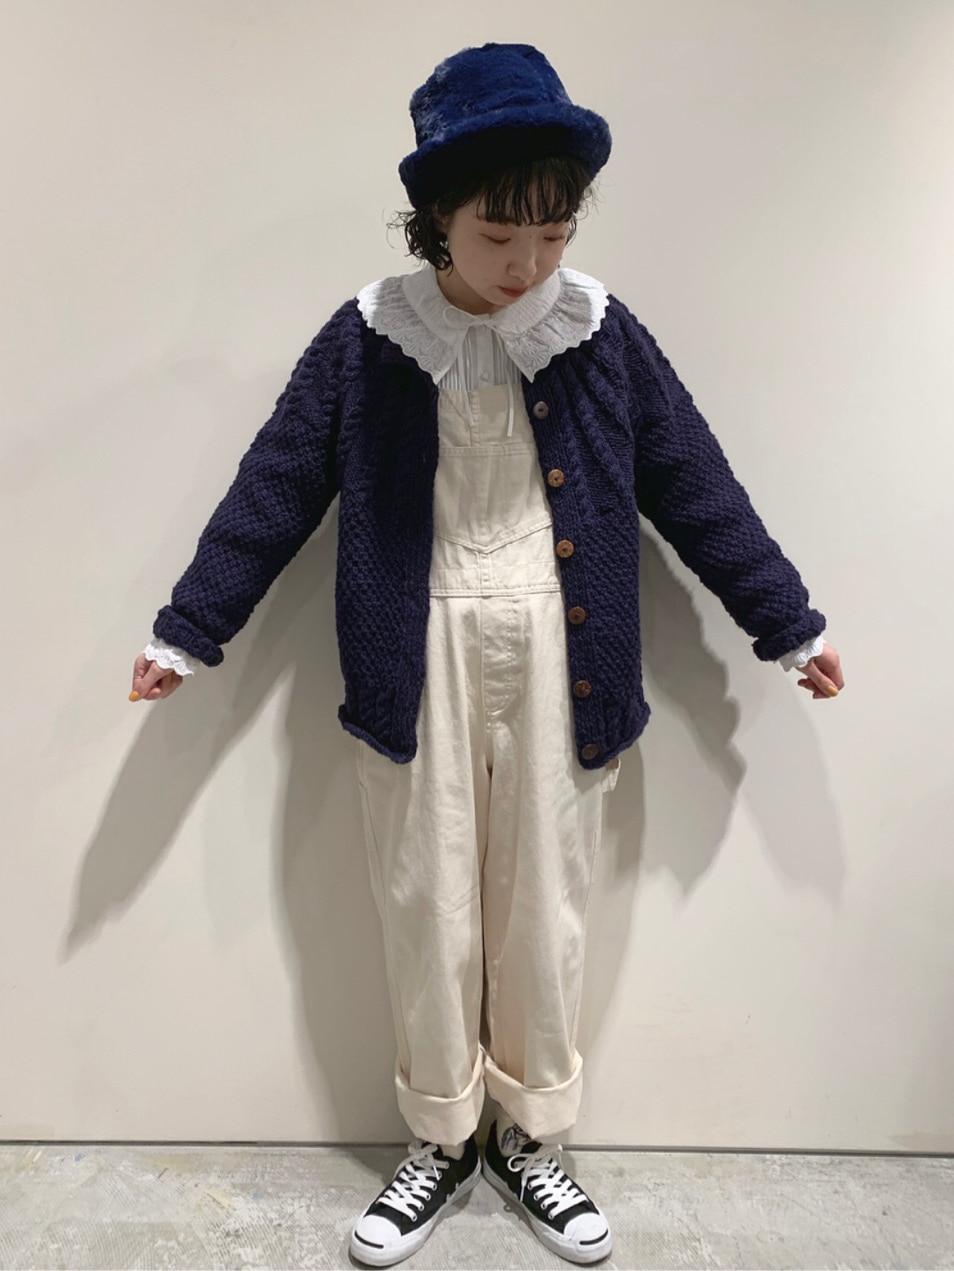 - CHILD WOMAN CHILD WOMAN , PAR ICI ルミネ横浜 身長:157cm 2020.10.19